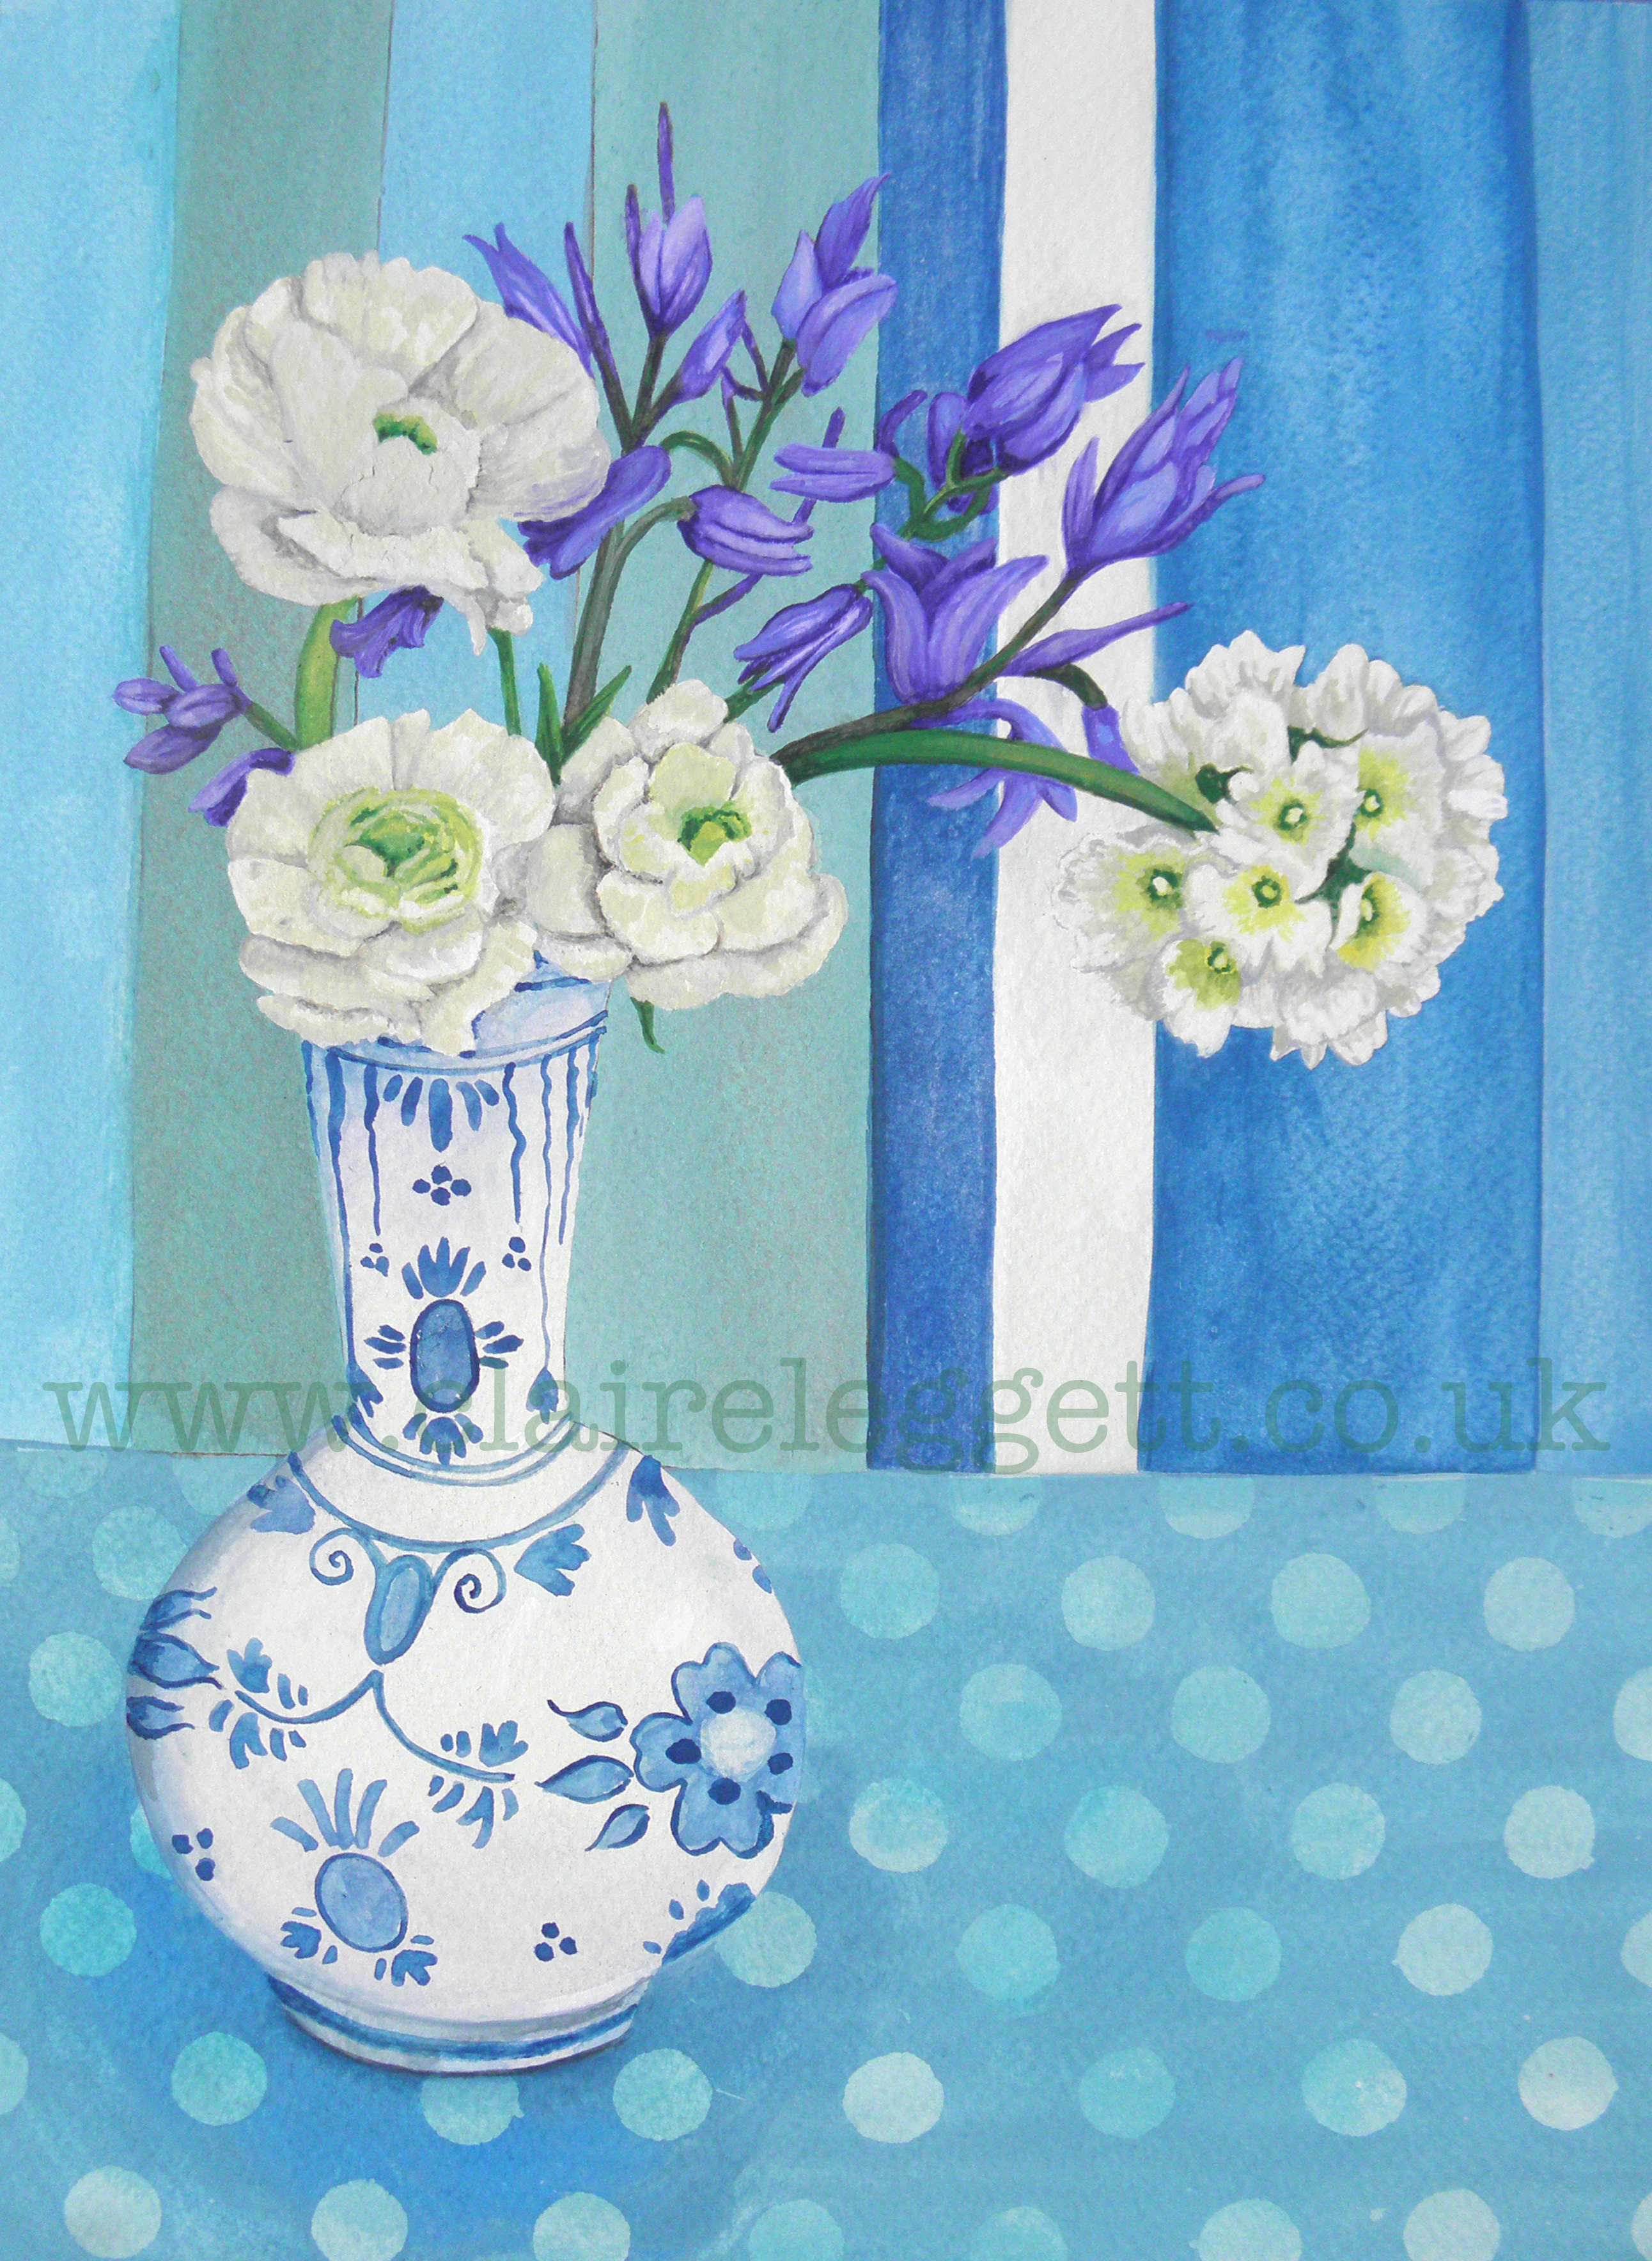 © Claire Leggett  Ranunculus and Bluebells